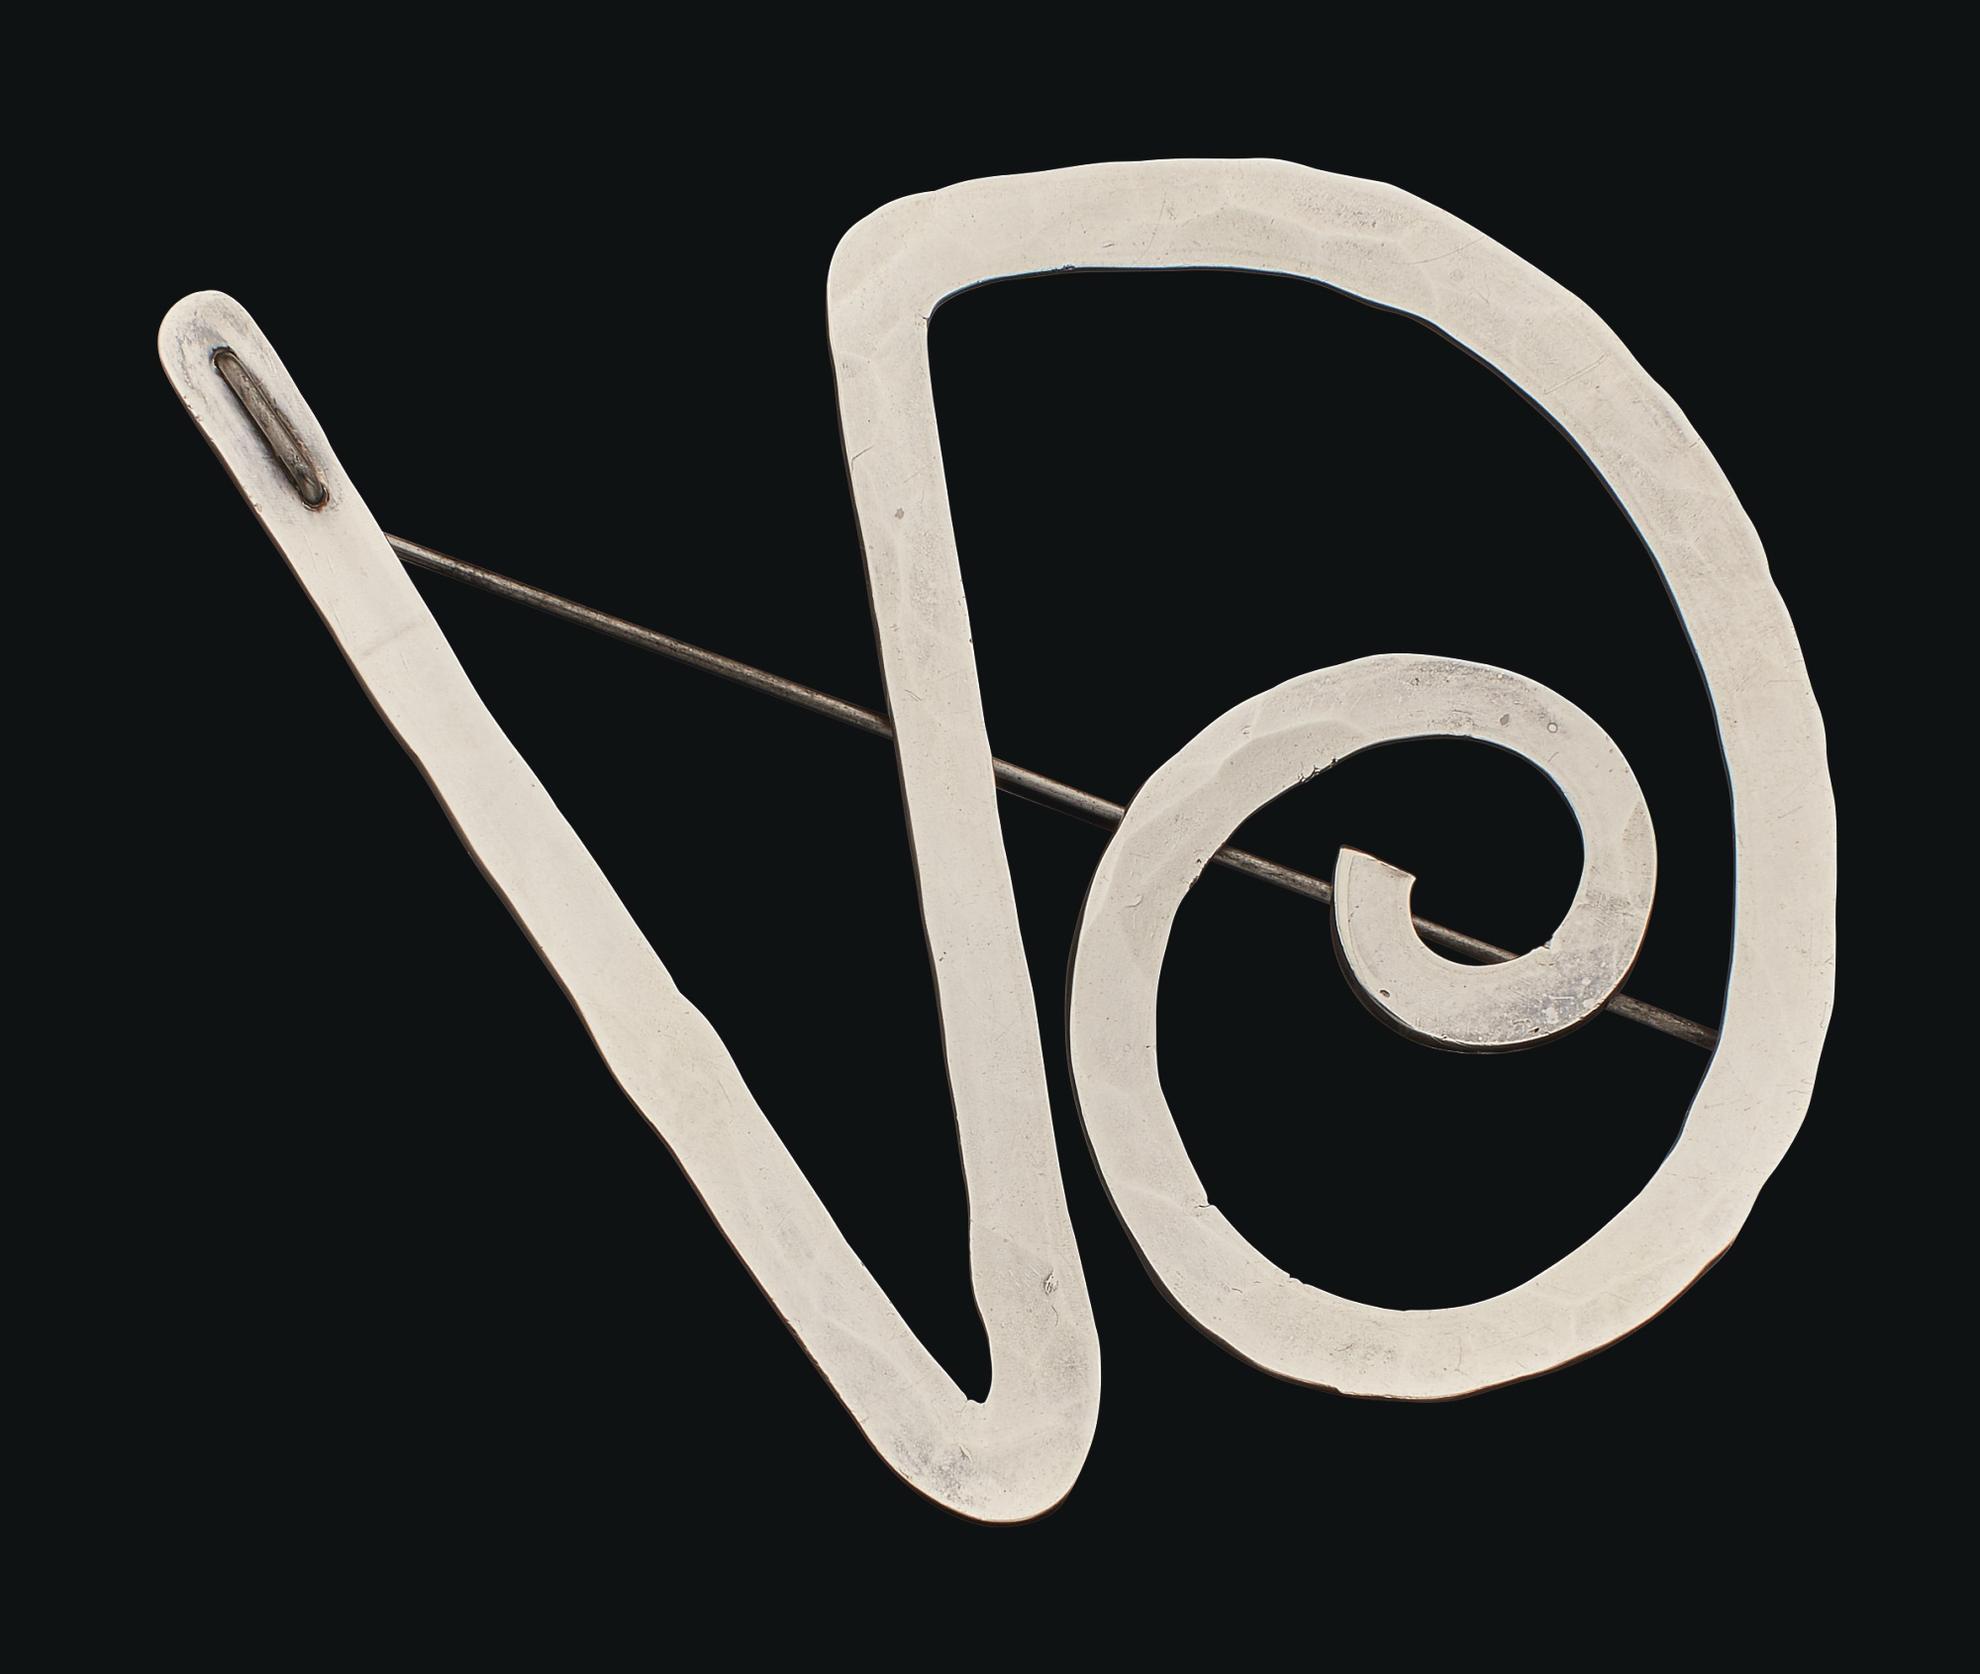 Alexander Calder-Vd Pin-1949